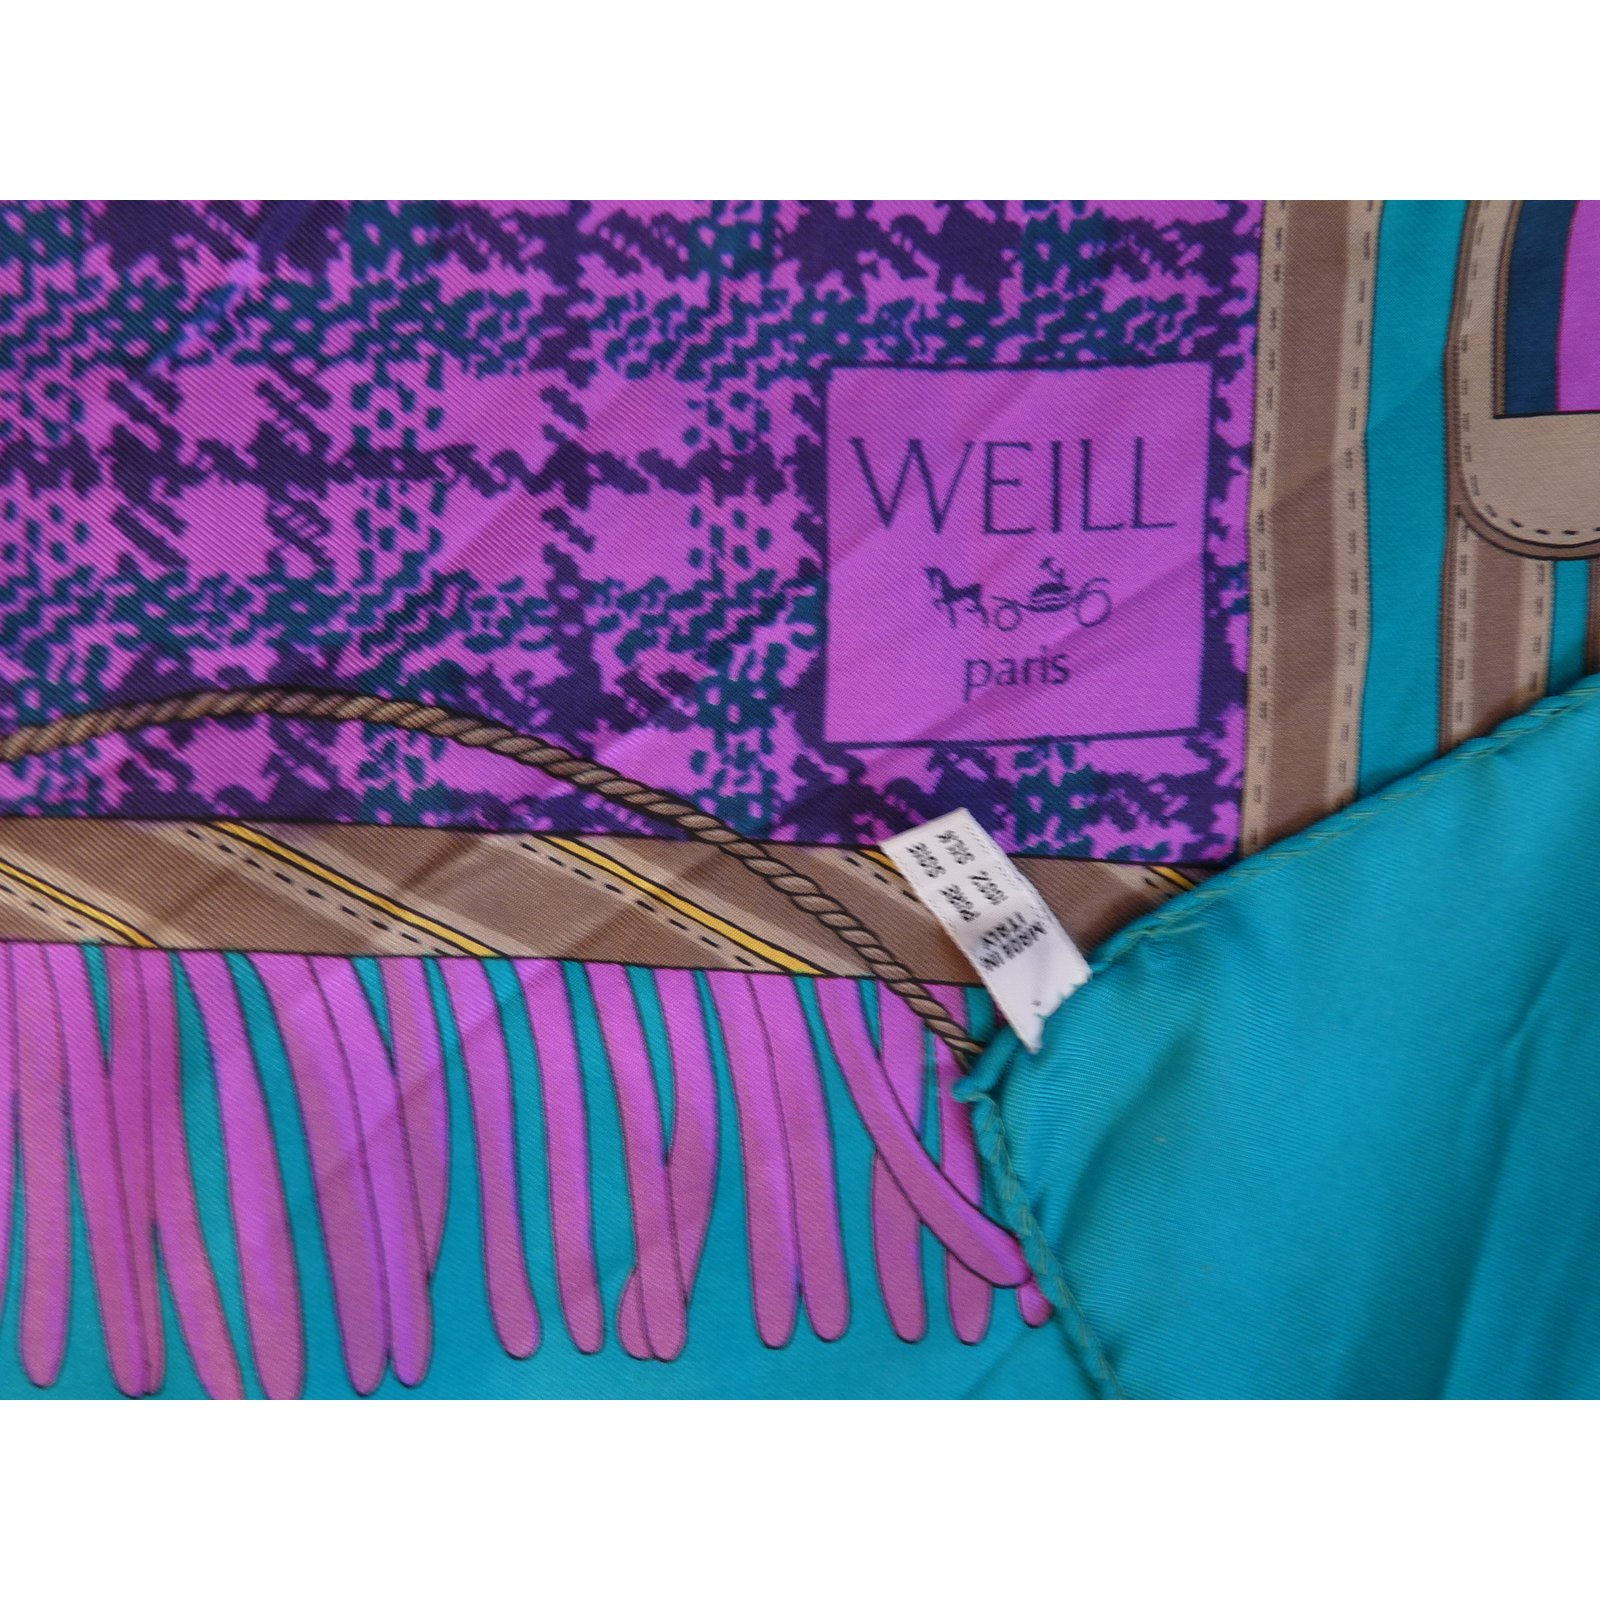 907a437a86ea Foulards Weill Foulards Soie Multicolore ref.46262 - Joli Closet